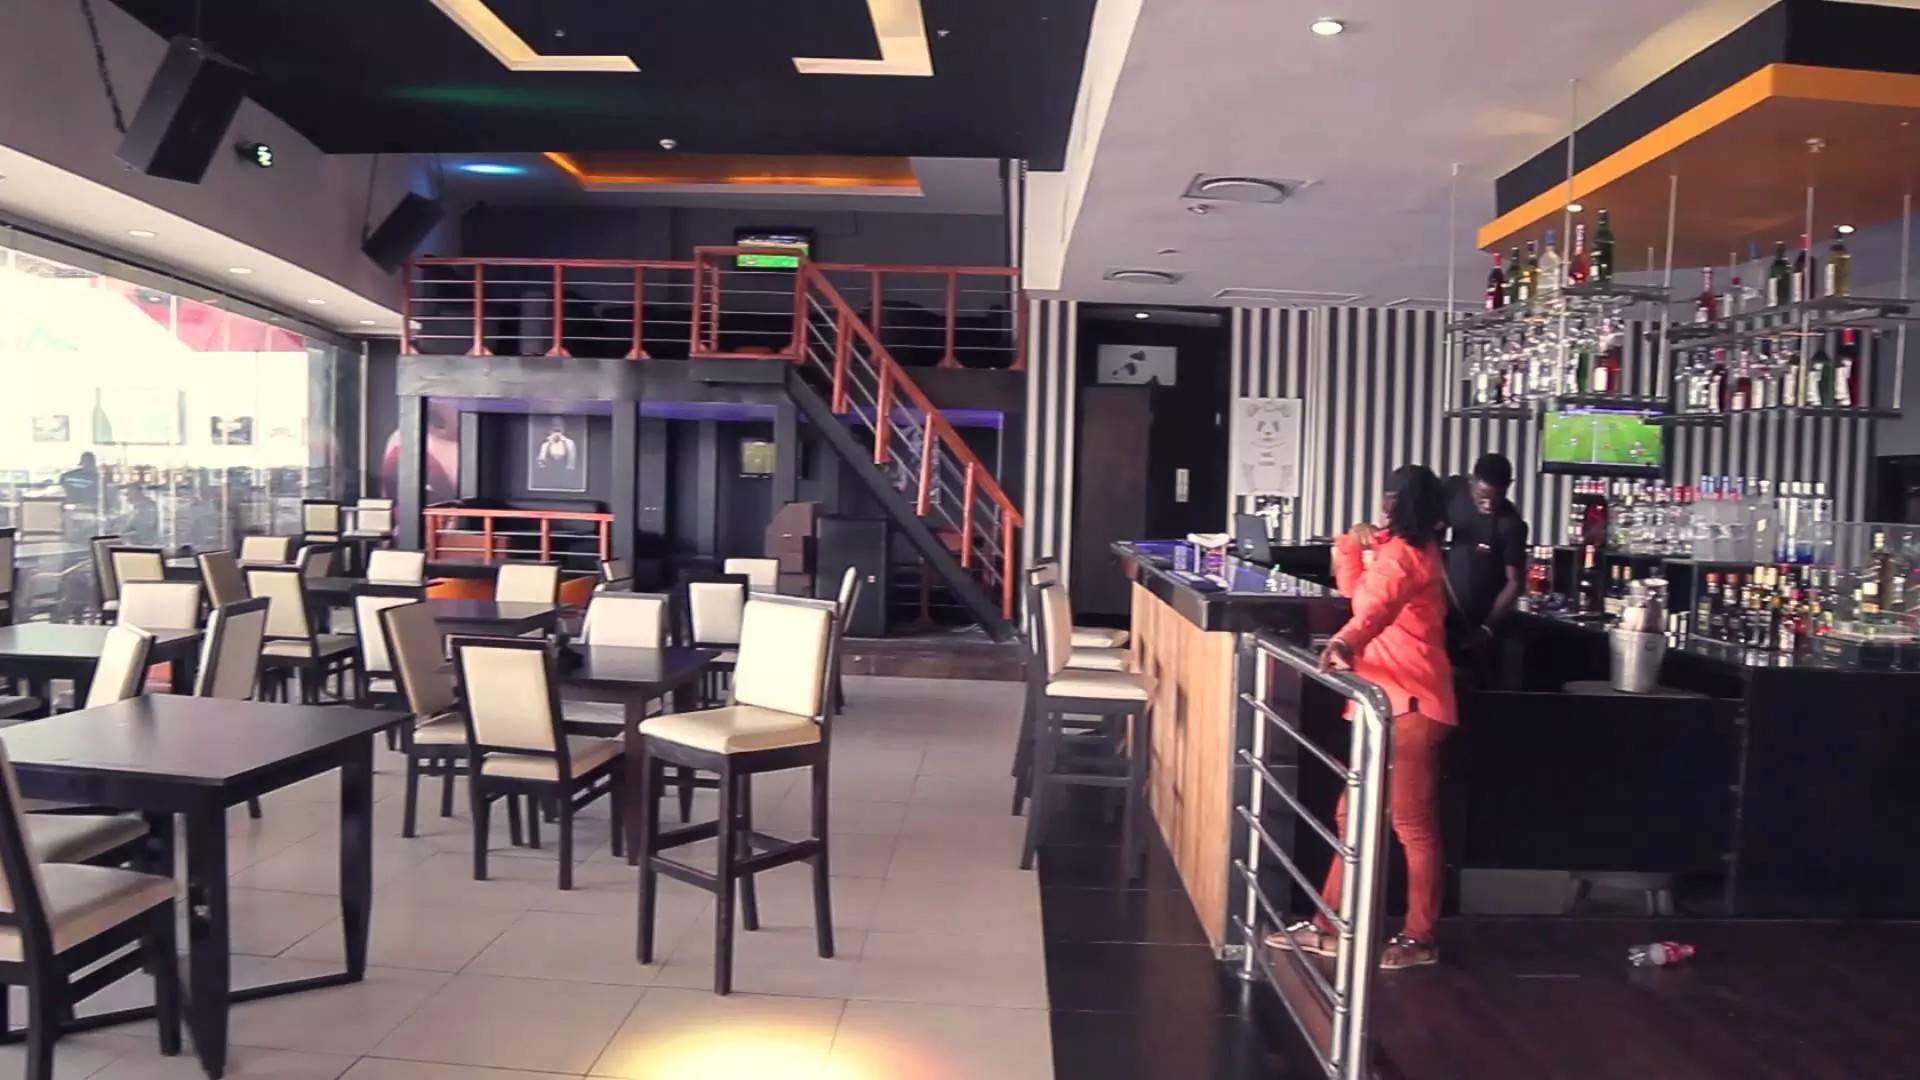 Bheerhugz Cafe, Ikeja